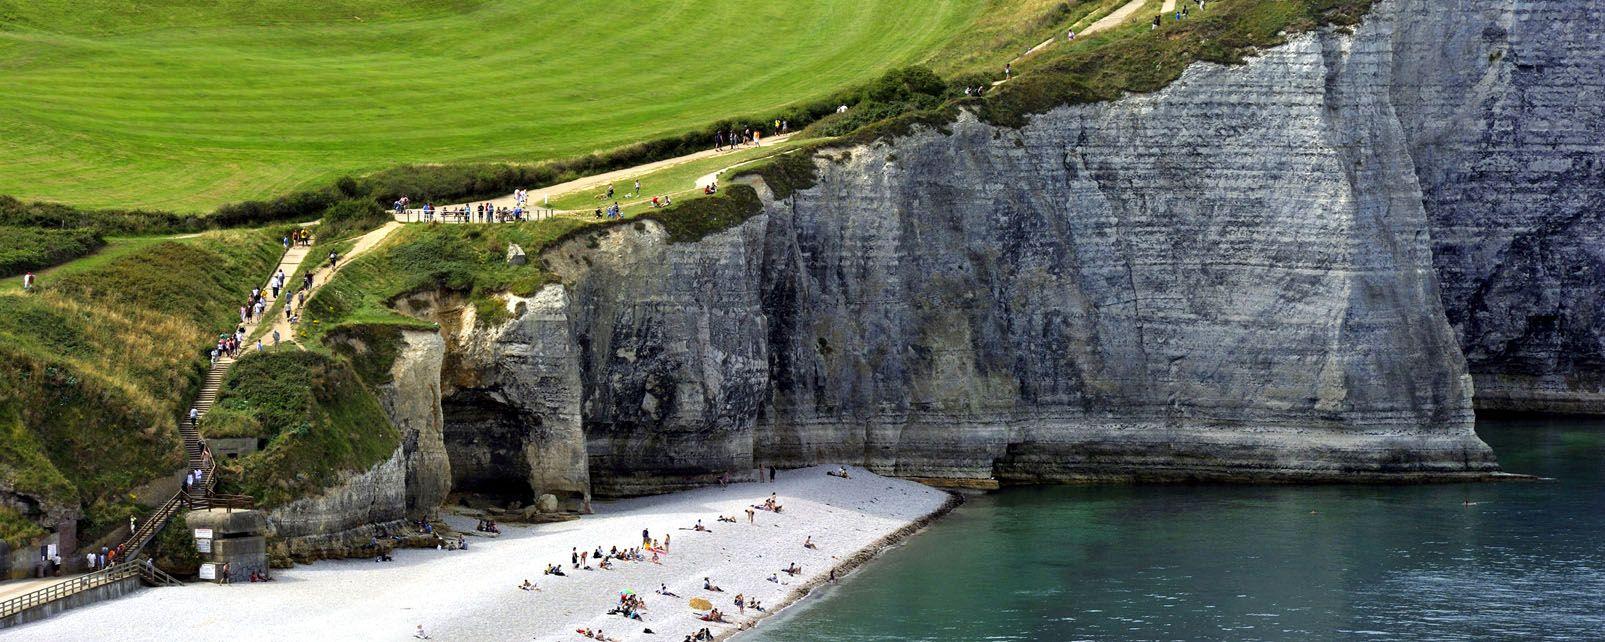 Les falaises d'Etretat , France